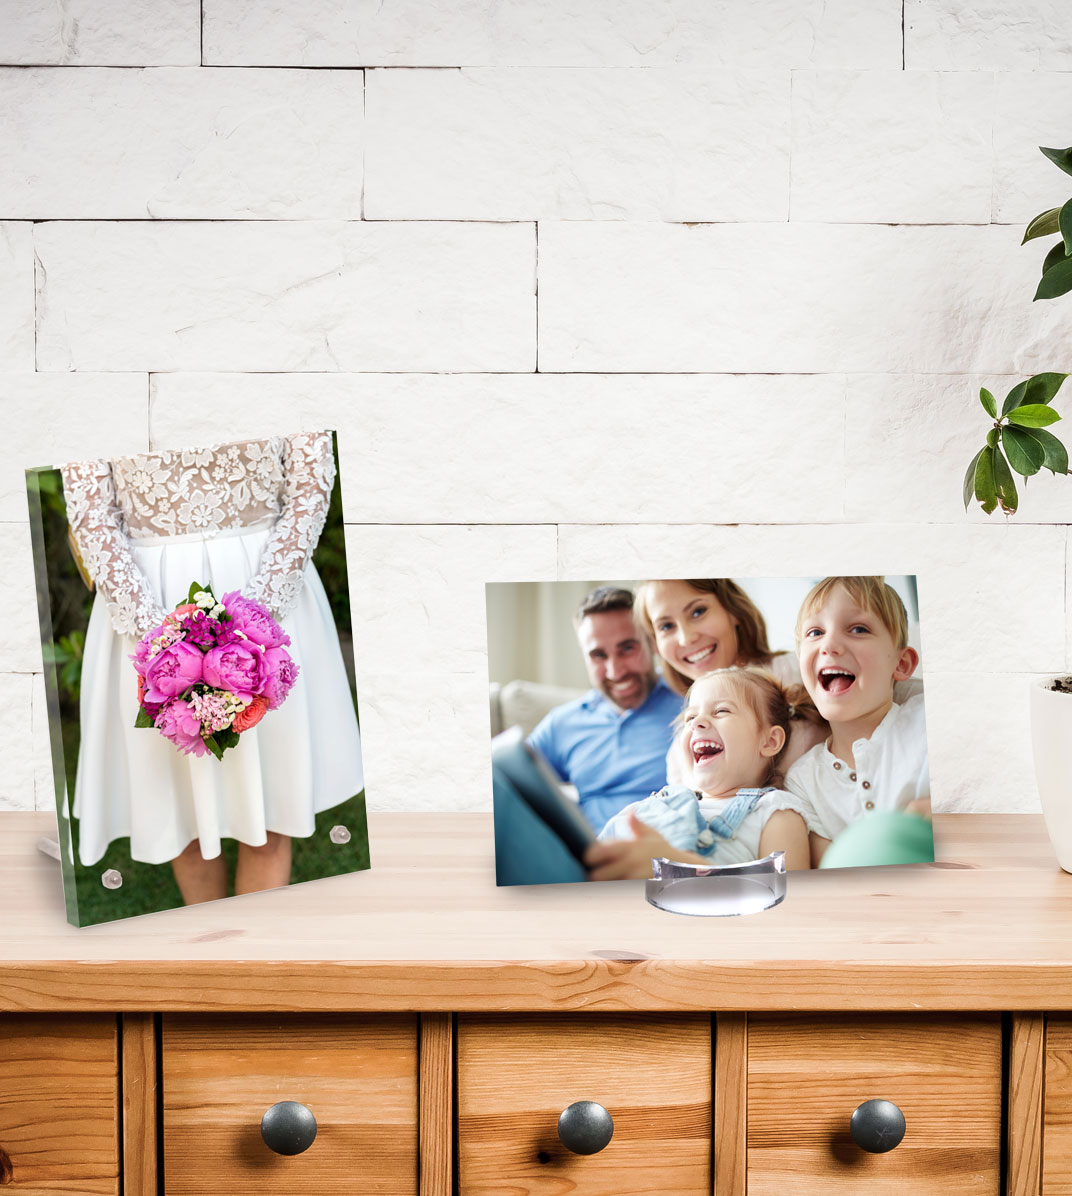 acrylglasbild online gestalten bestellen hofer fotos. Black Bedroom Furniture Sets. Home Design Ideas